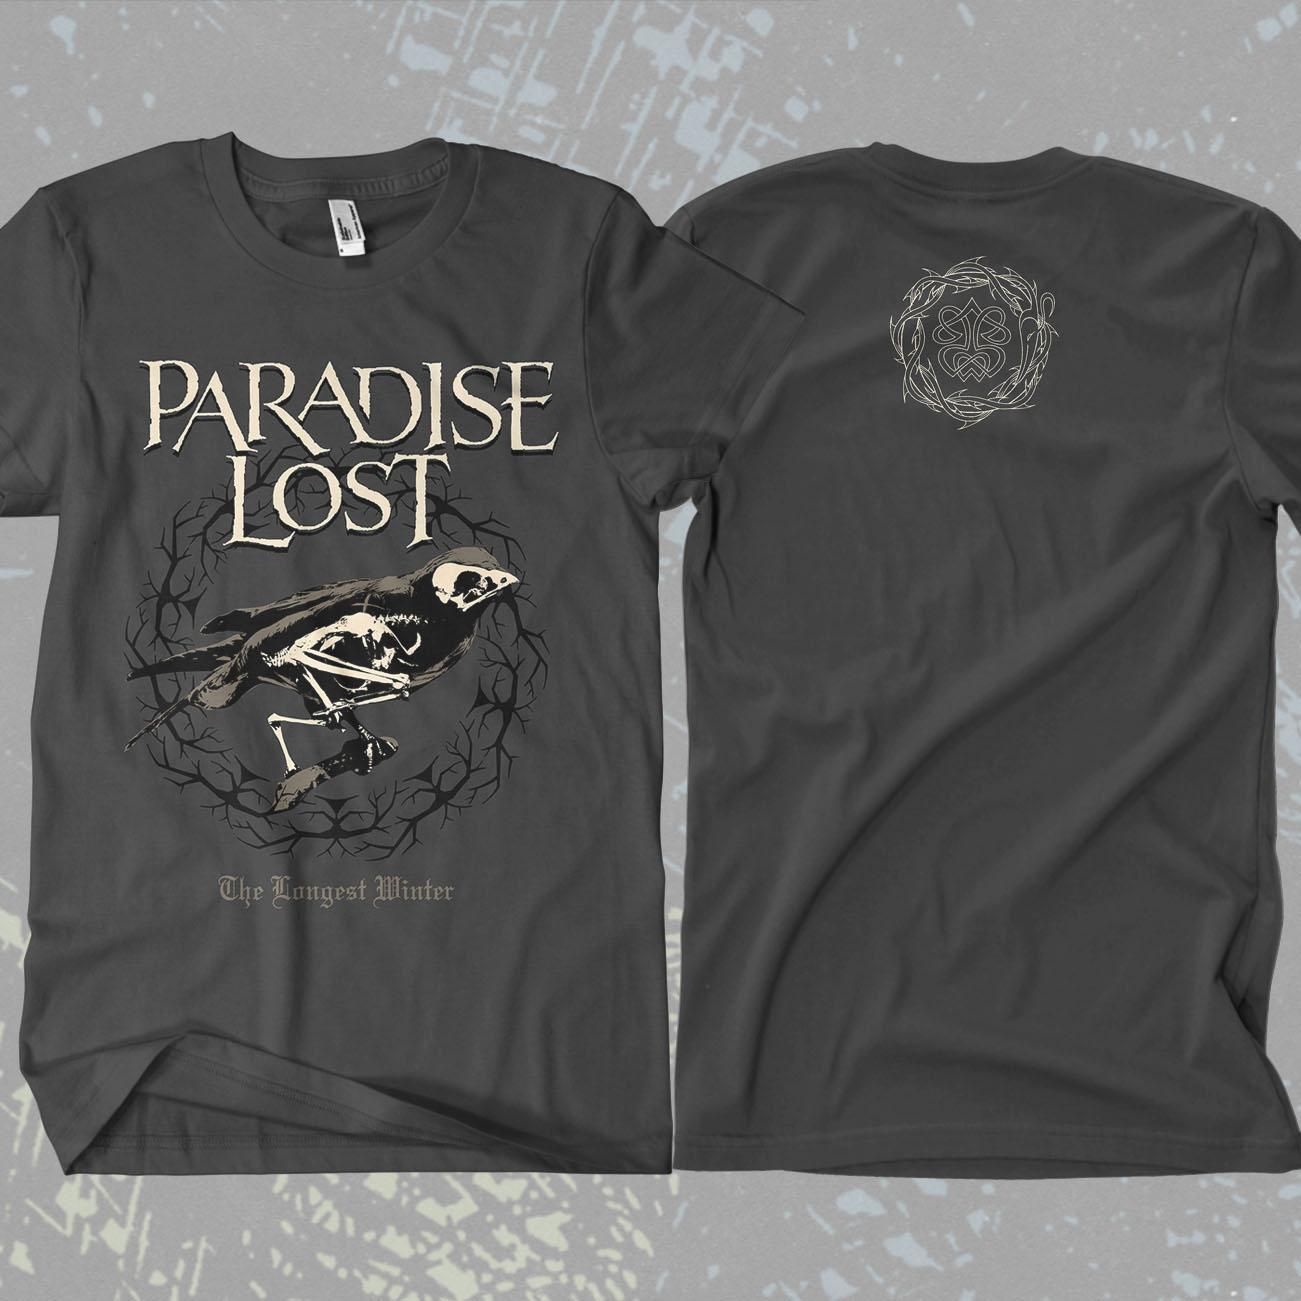 Paradise Lost - 'Longest Winter' T-Shirt - Paradise Lost